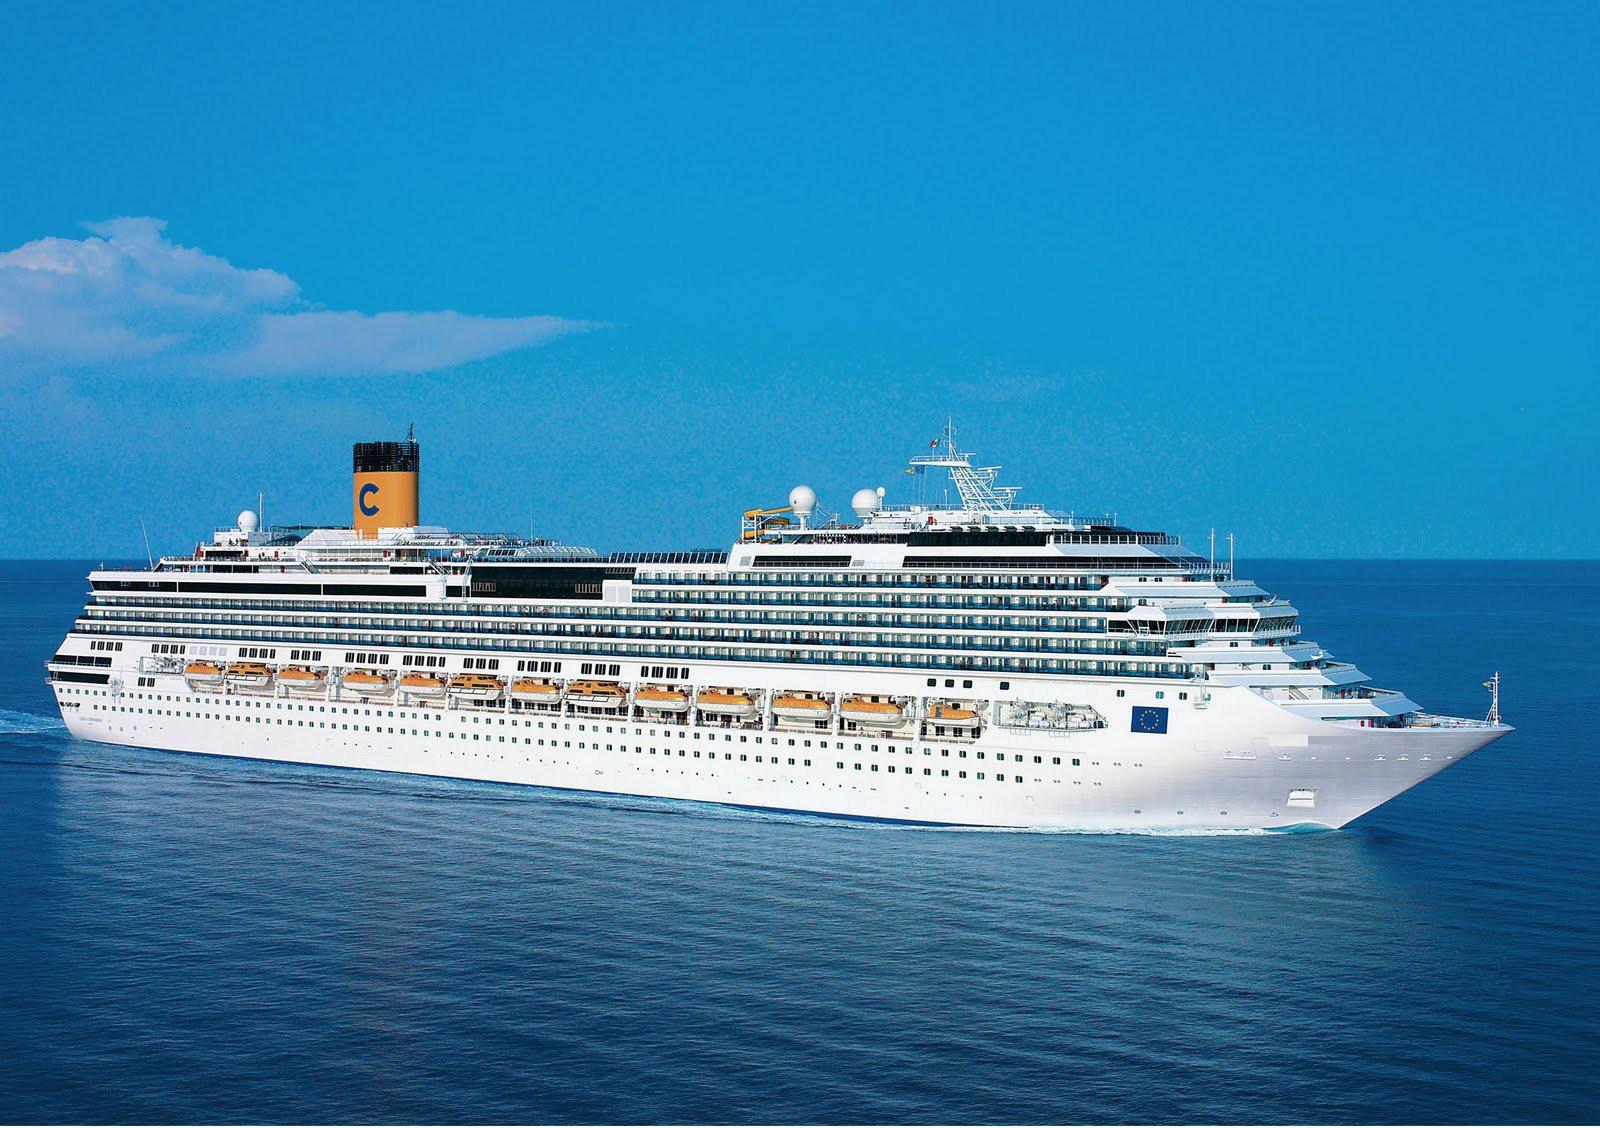 Croaziera 2017 - Mediterana de Vest (Barcelona) - Costa Cruises - Costa Favolosa - 3 nopti